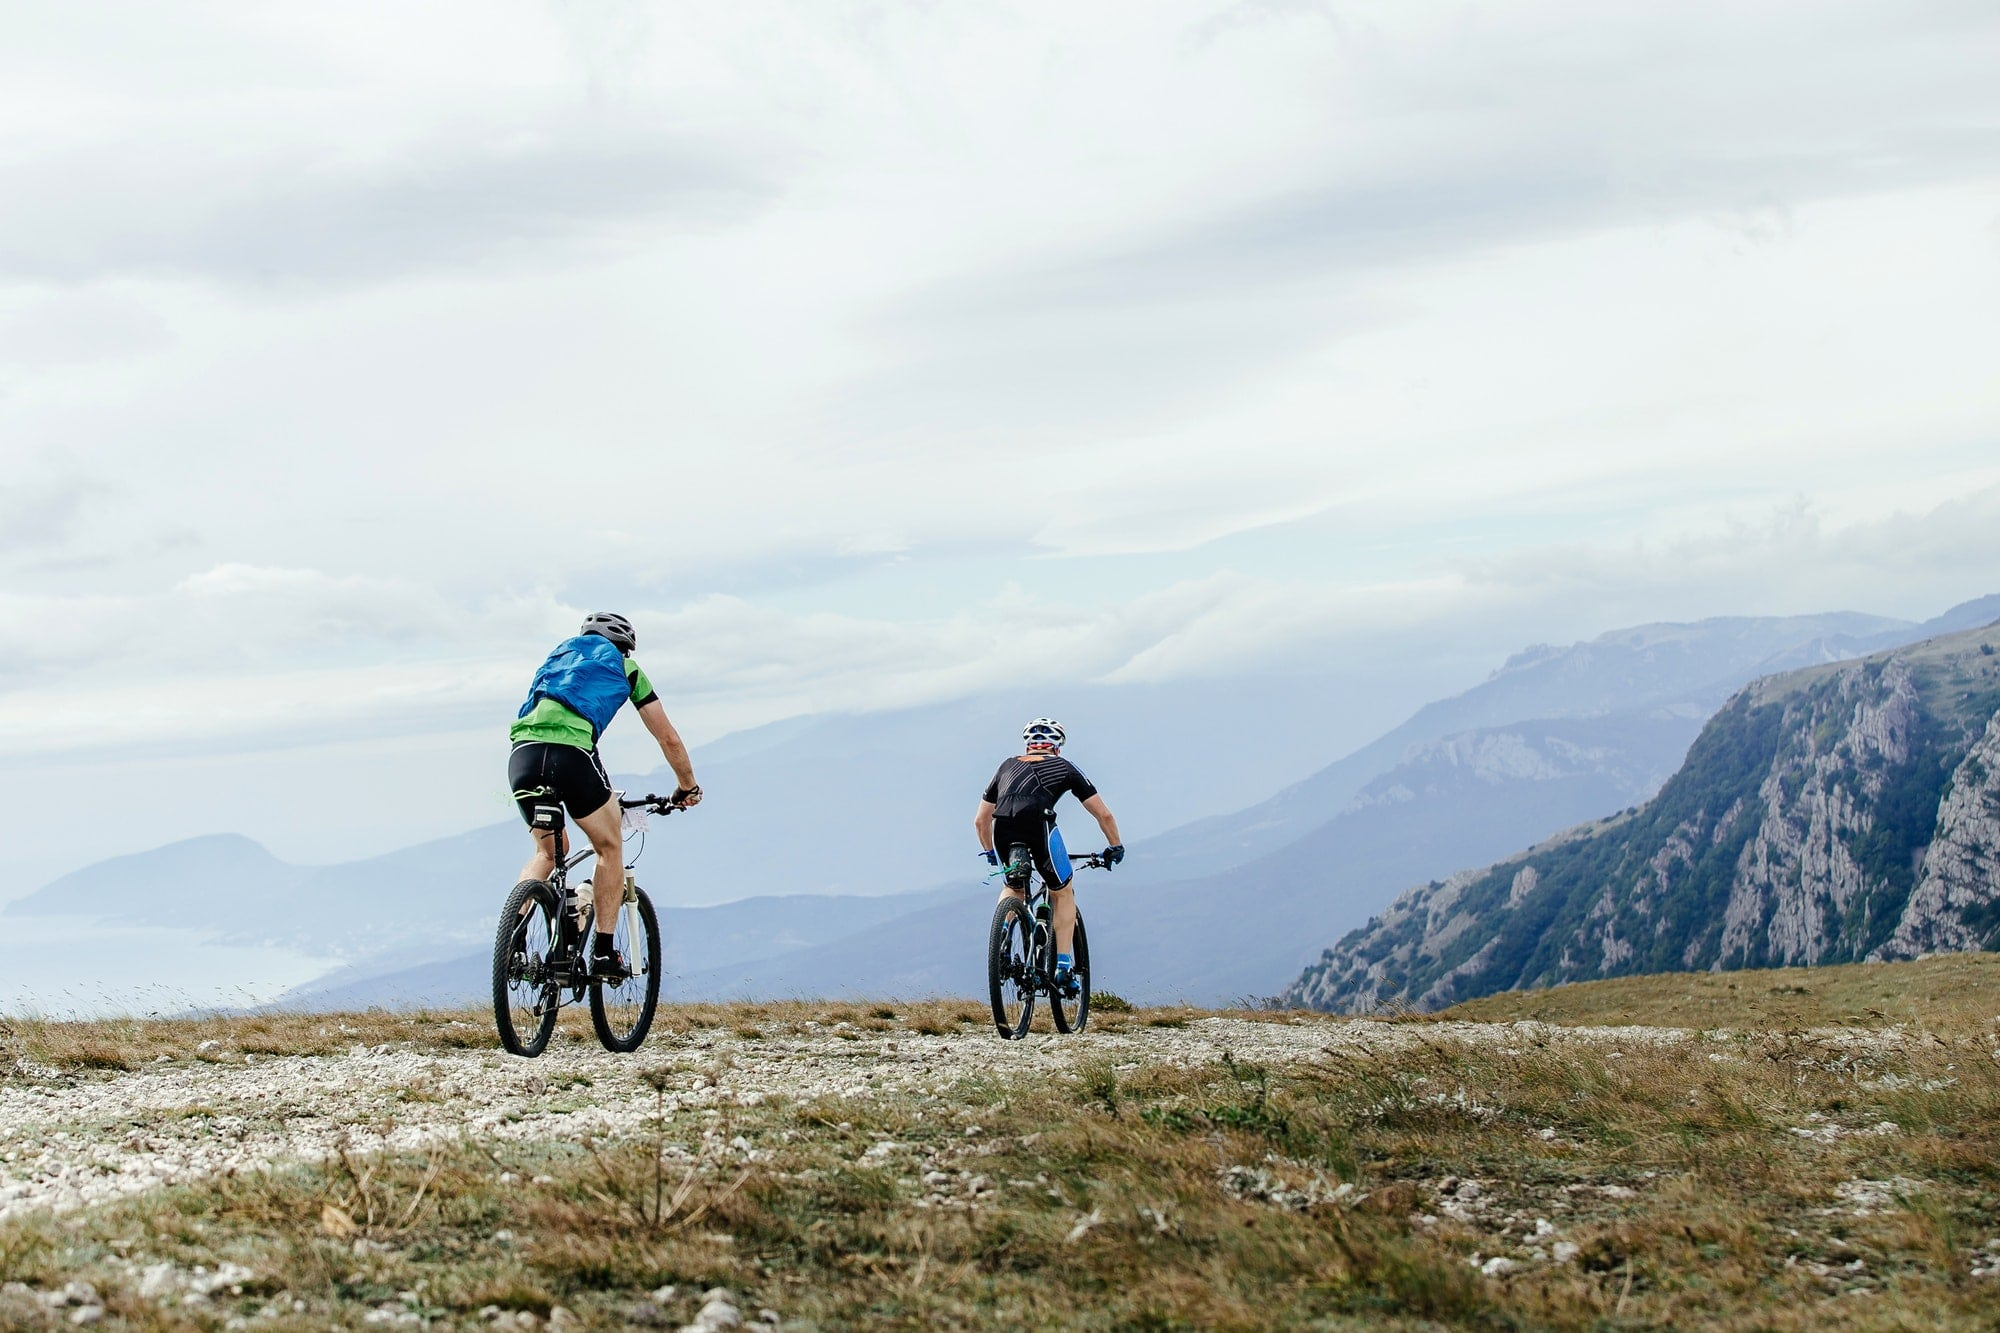 Two Men Cyclists on Mountainbike